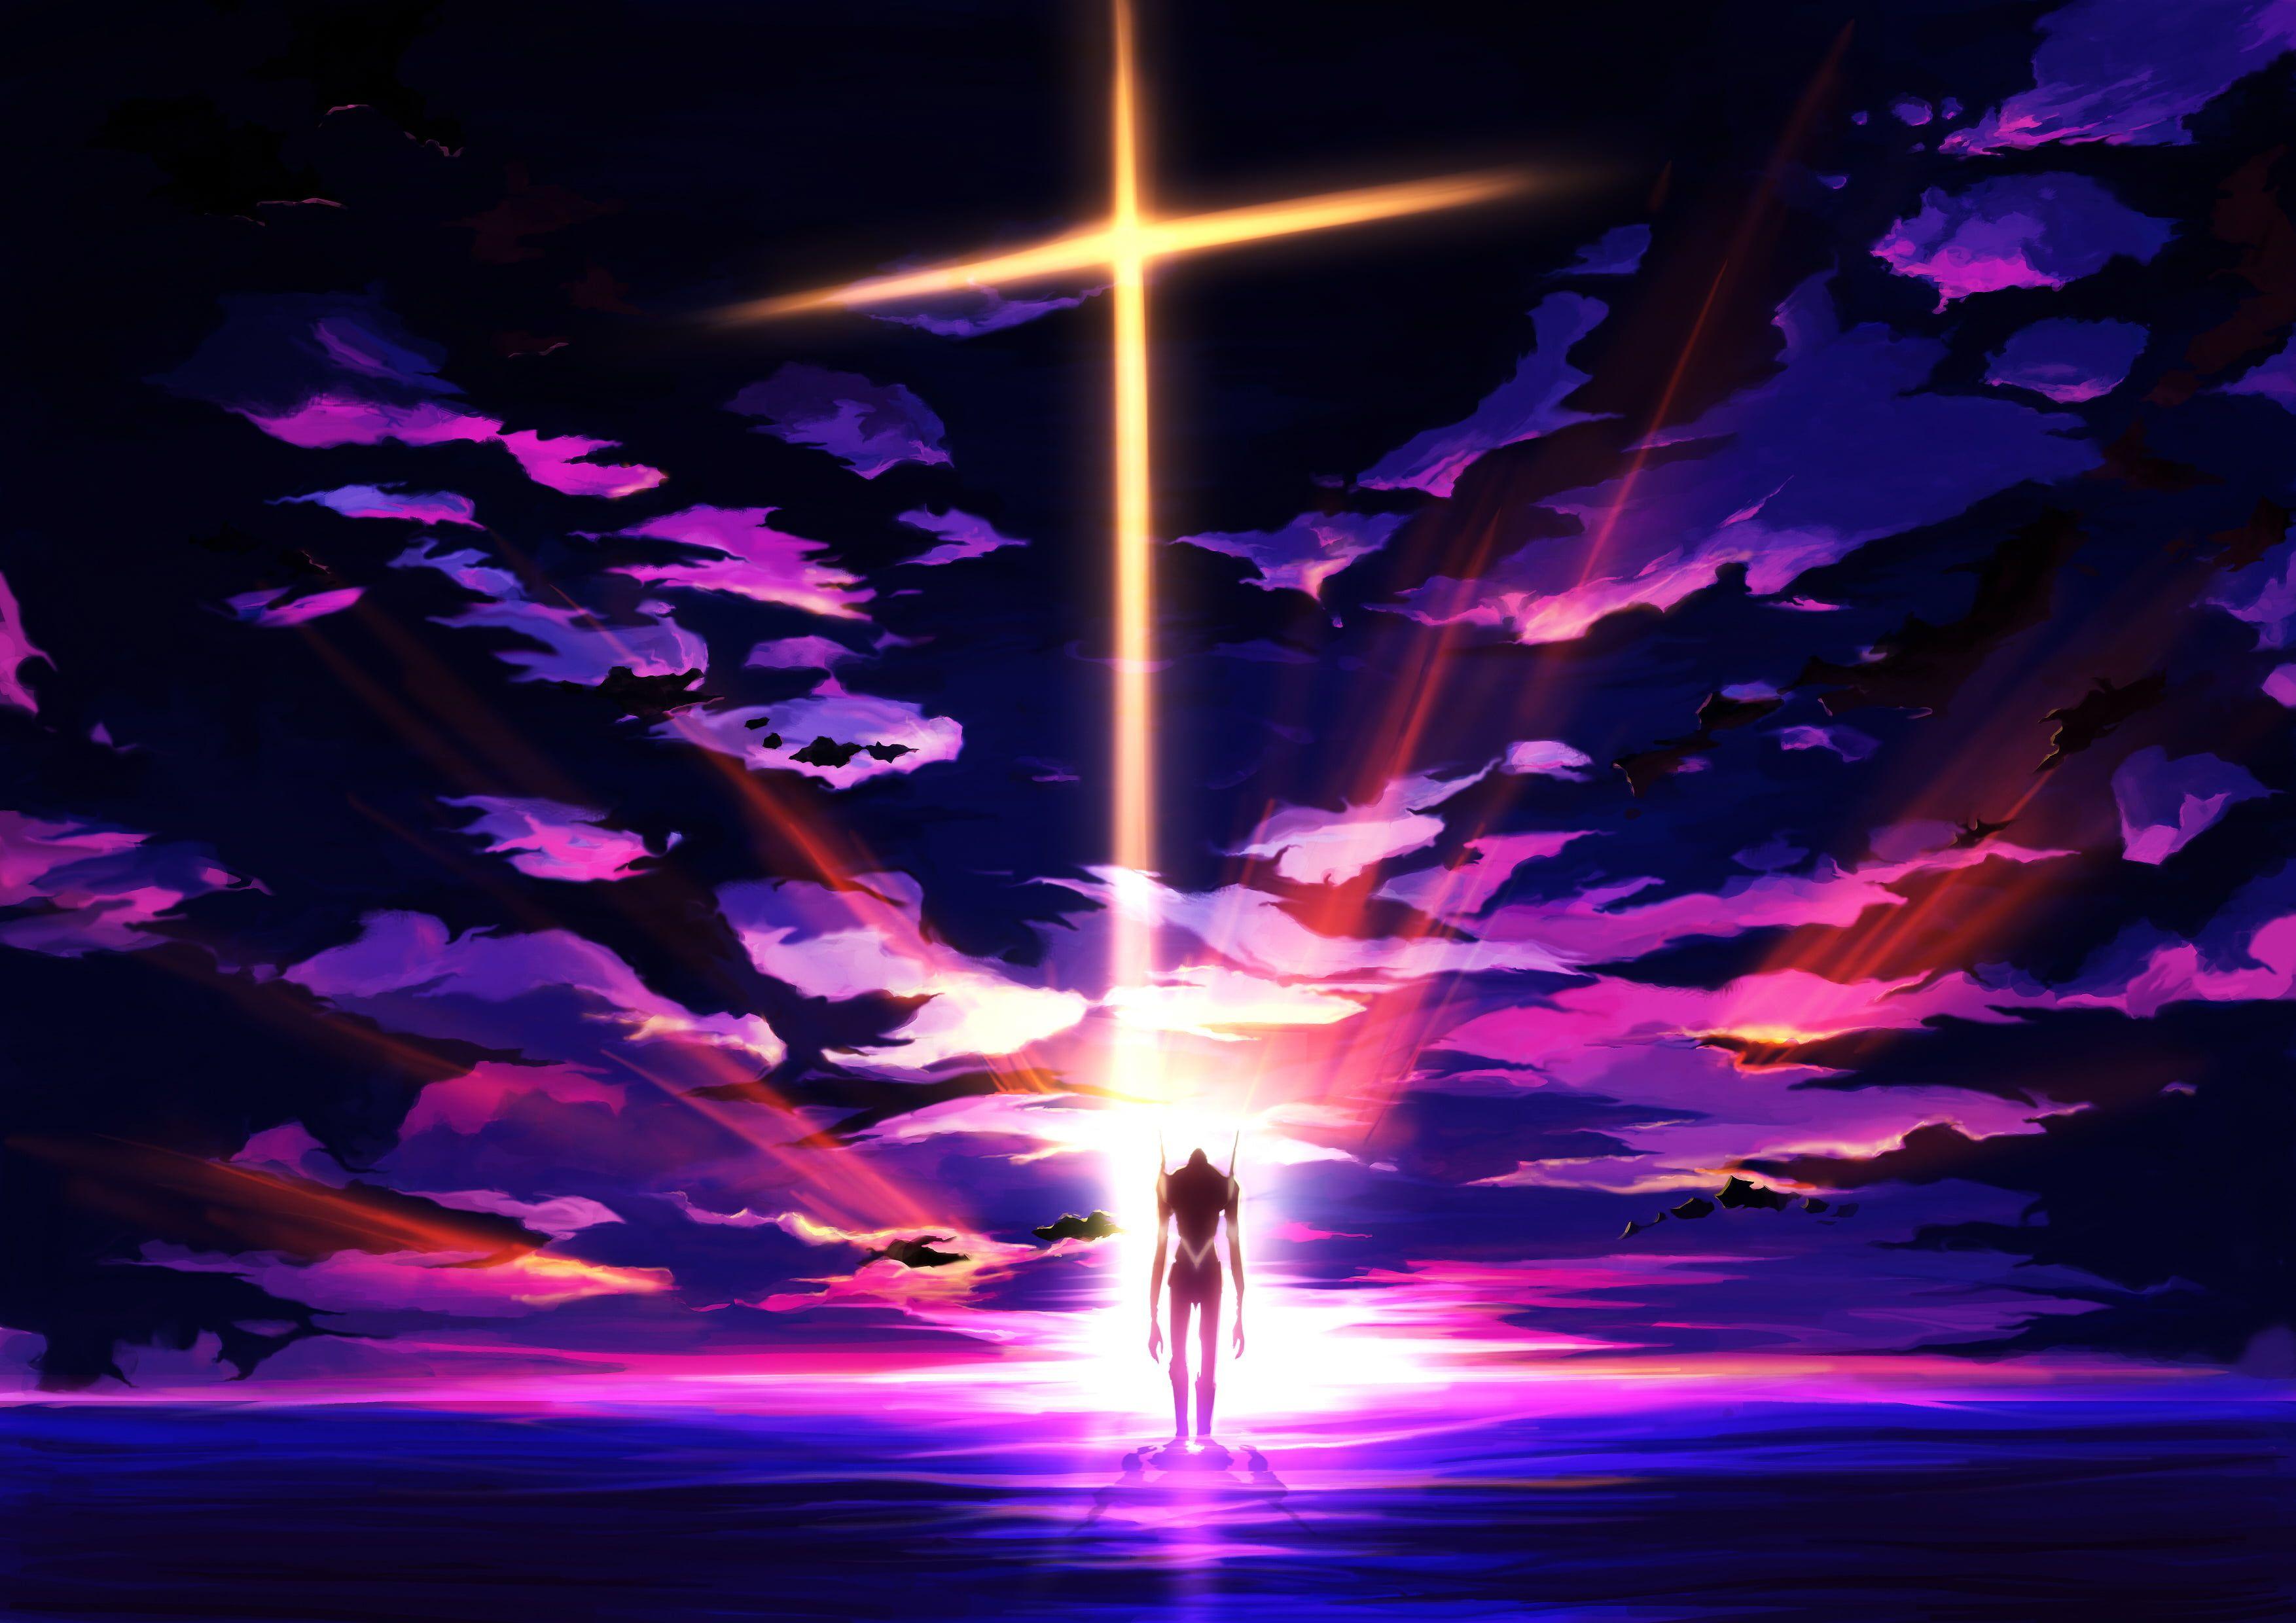 Neon Genesis Evangelion Wallpaper Neon Genesis Evangelion Eva Unit 01 Anime Cross 2k Wallpaper Hdwallpaper Desk Neon Wallpaper Anime Wallpaper Evangelion